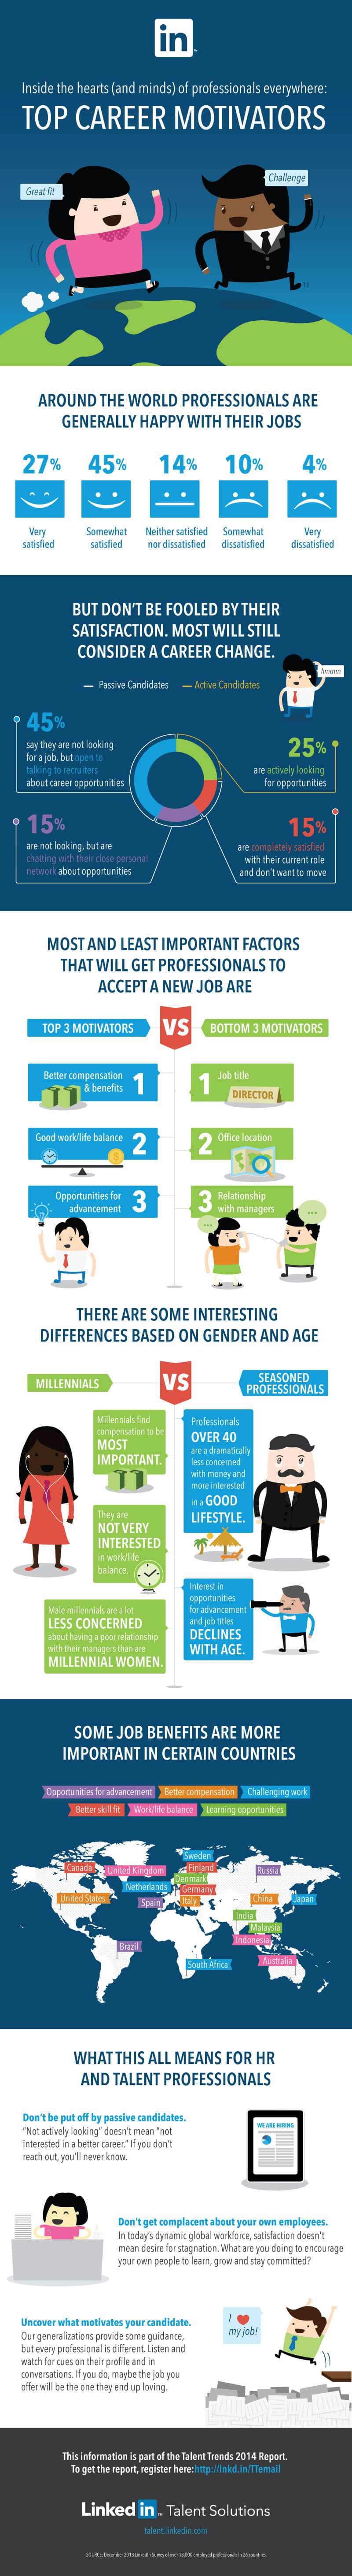 career-motivation-talent-trends